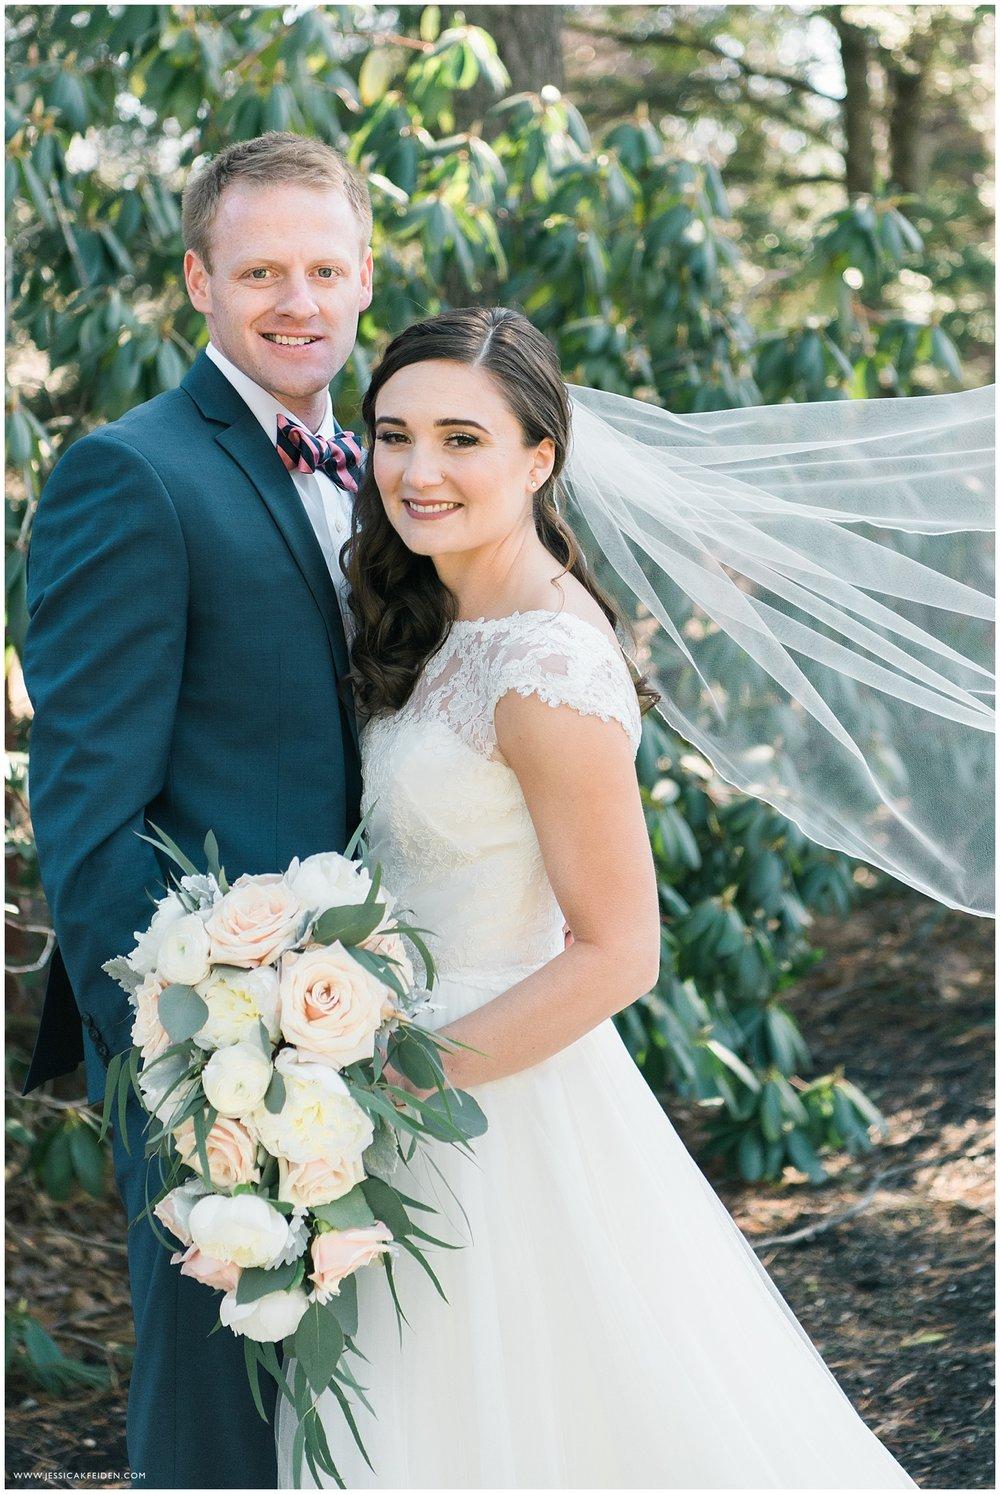 Jessica K Feiden Photography_Birch Wood Vineyards New Hampshire Wedding_0013.jpg